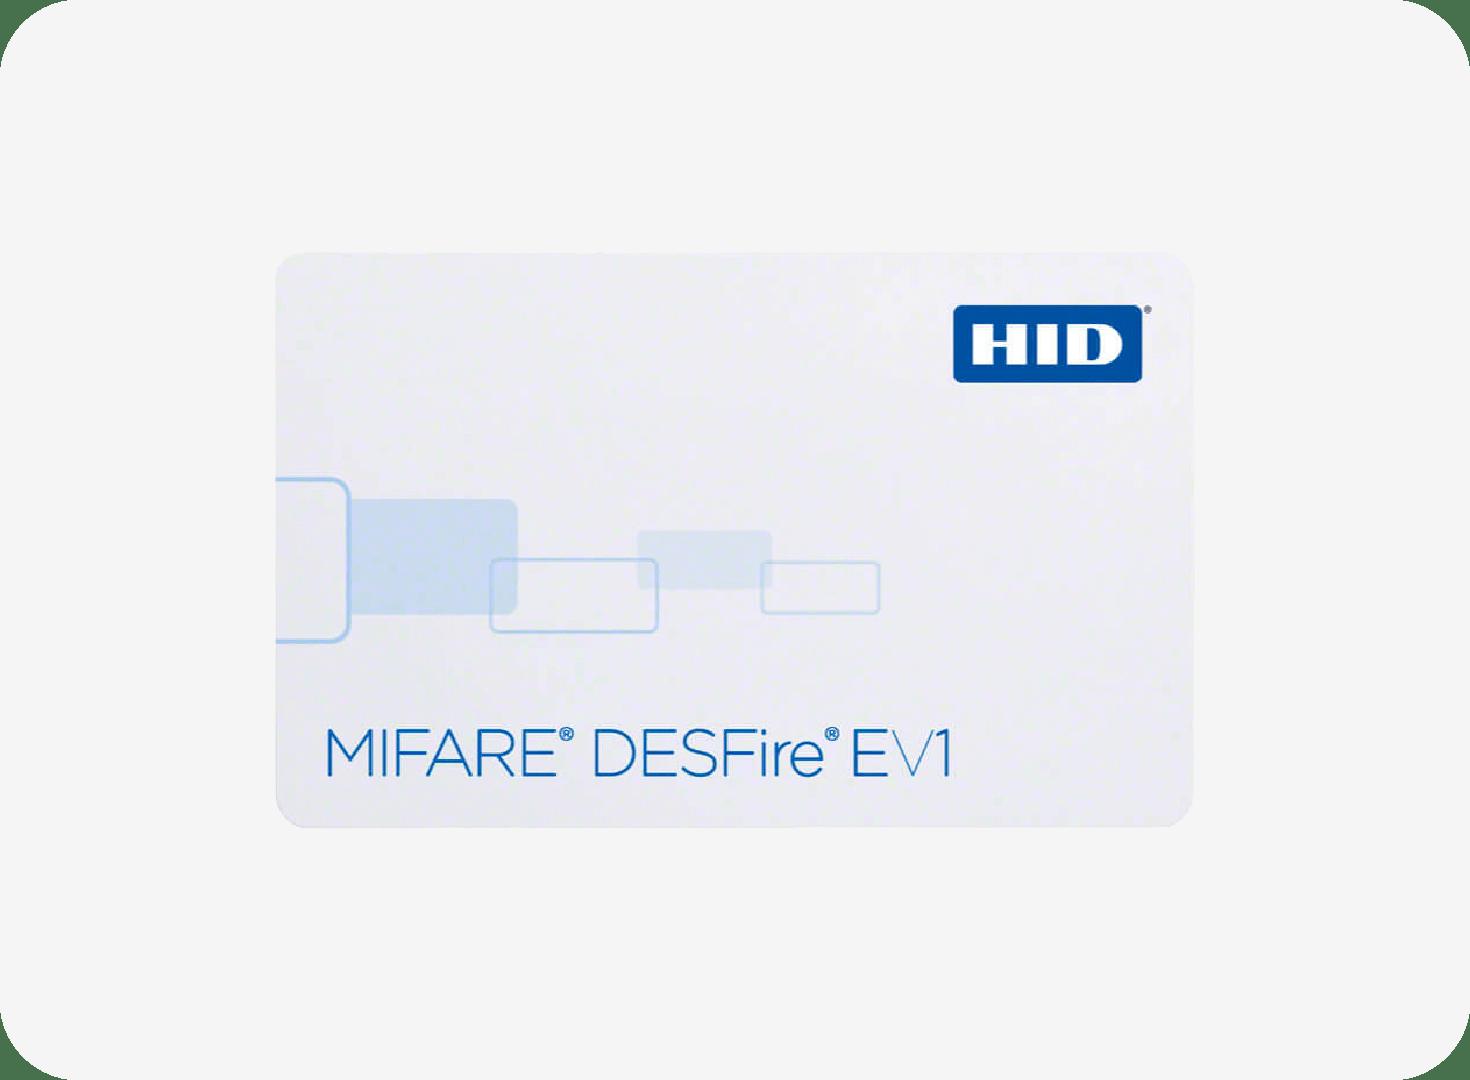 HID MIFARE DESFire EV1 / HID Prox Combo 1451 Card